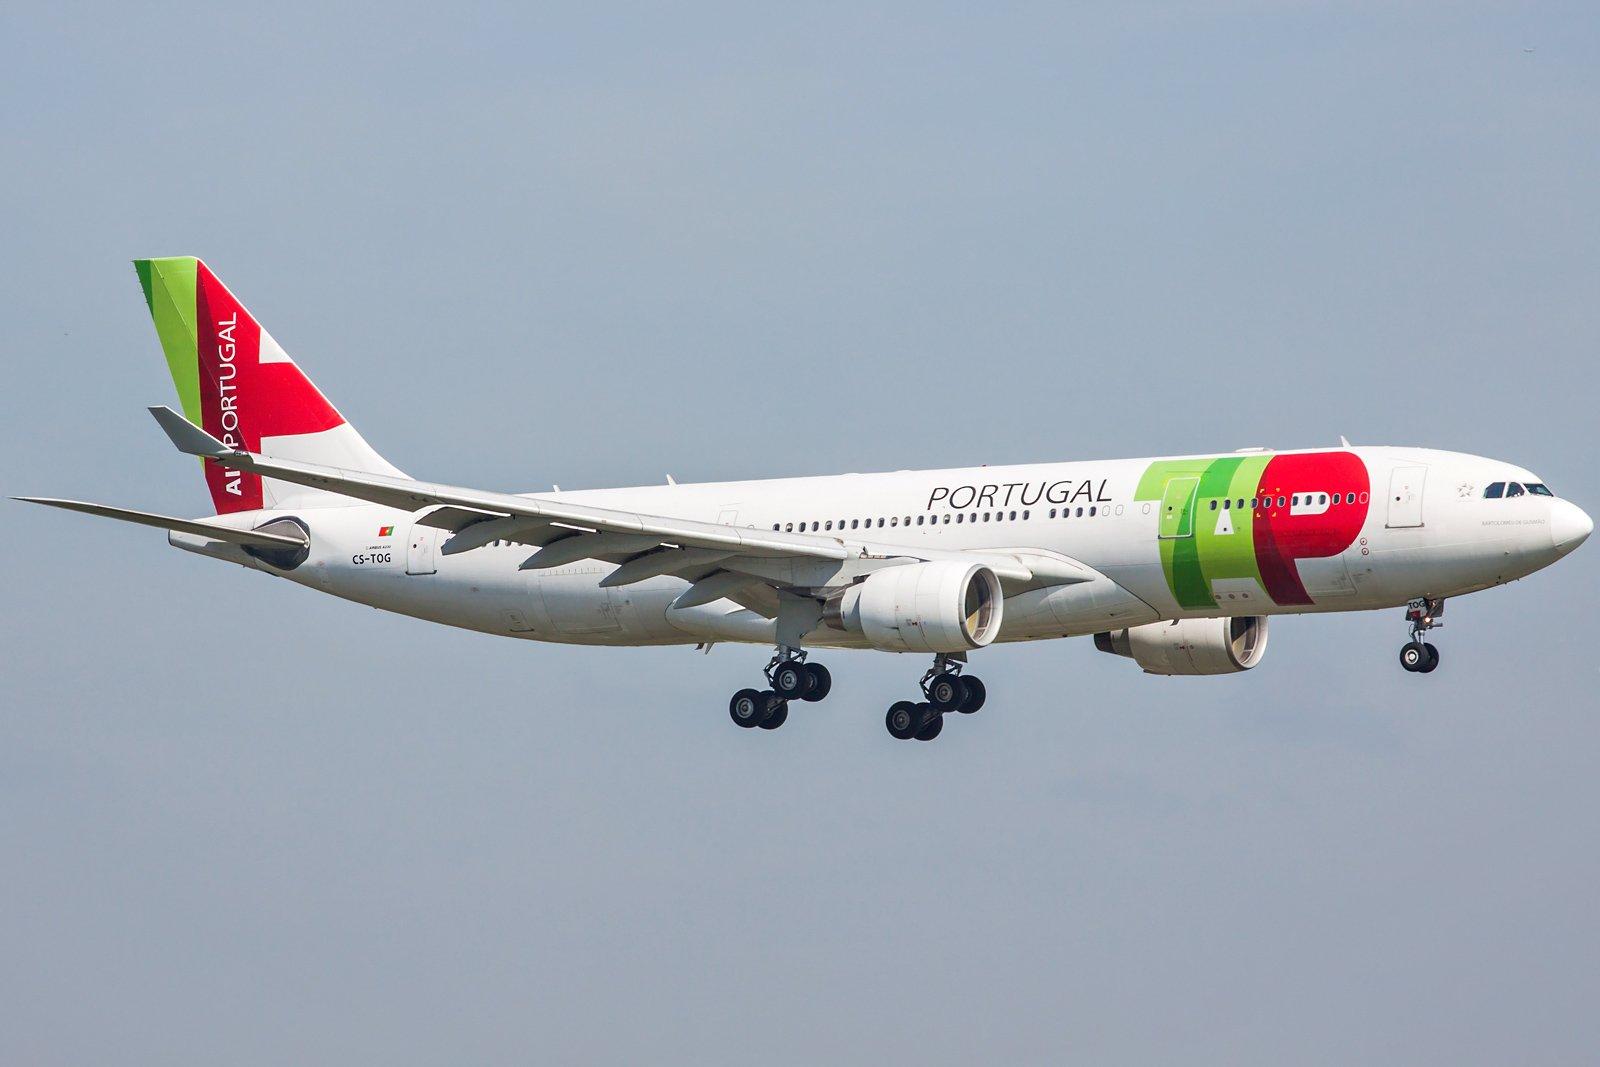 TAP - Air Portugal Airbus A330-223 CS-TOG